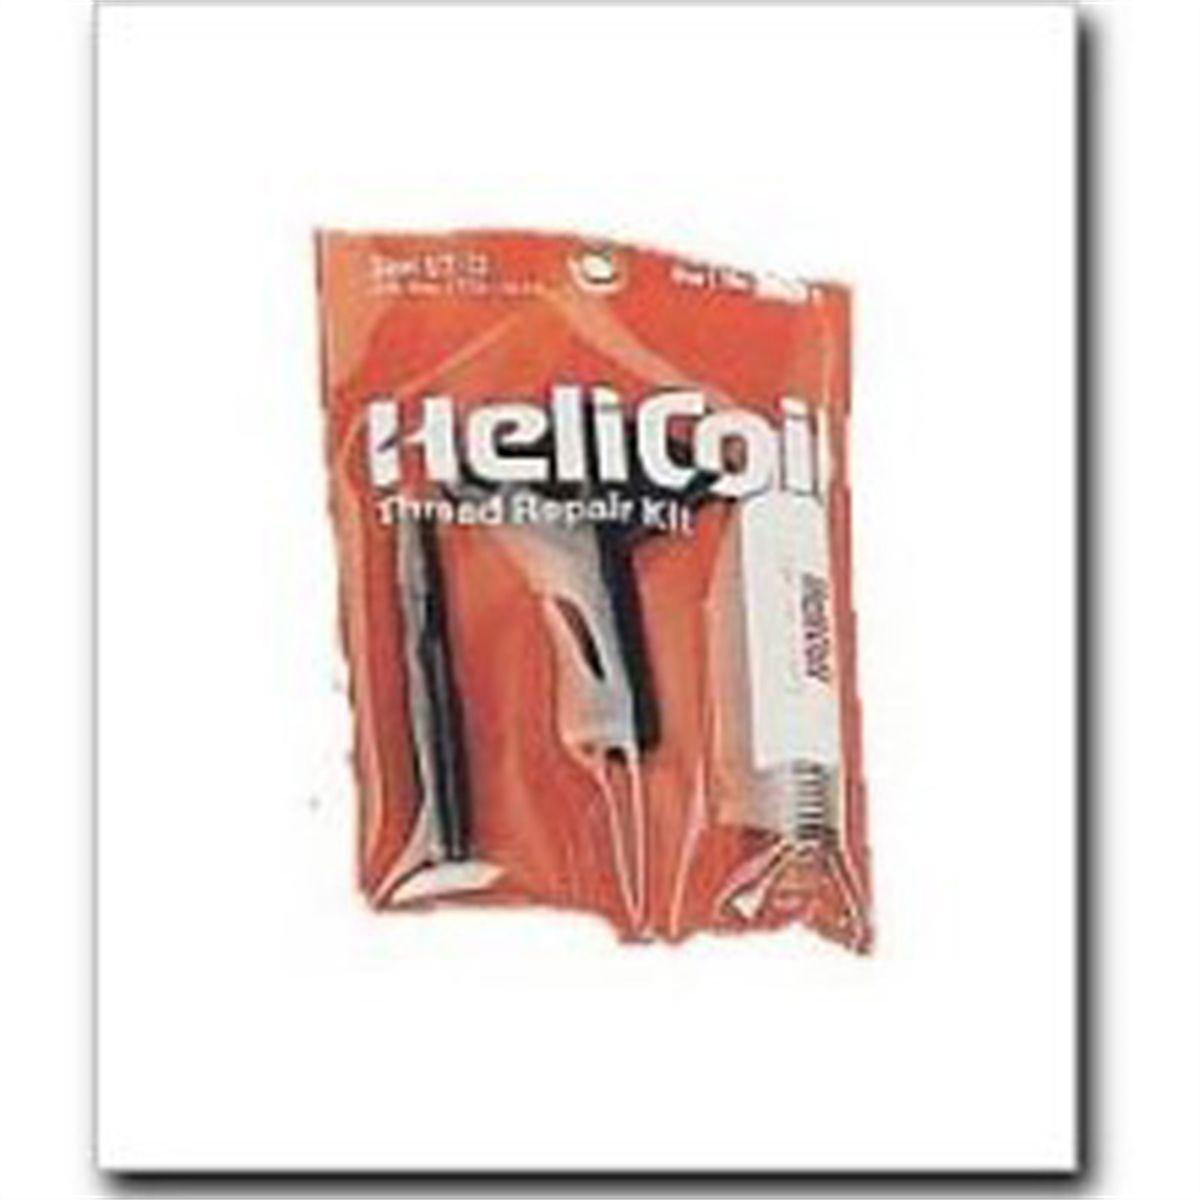 Heli Coil 5528 10 Inch Fine Thread Repair Kit 5 8 18 X 938 Hel5528 Replacement Tool Parts Wilton 644 111217 Vise Diagram